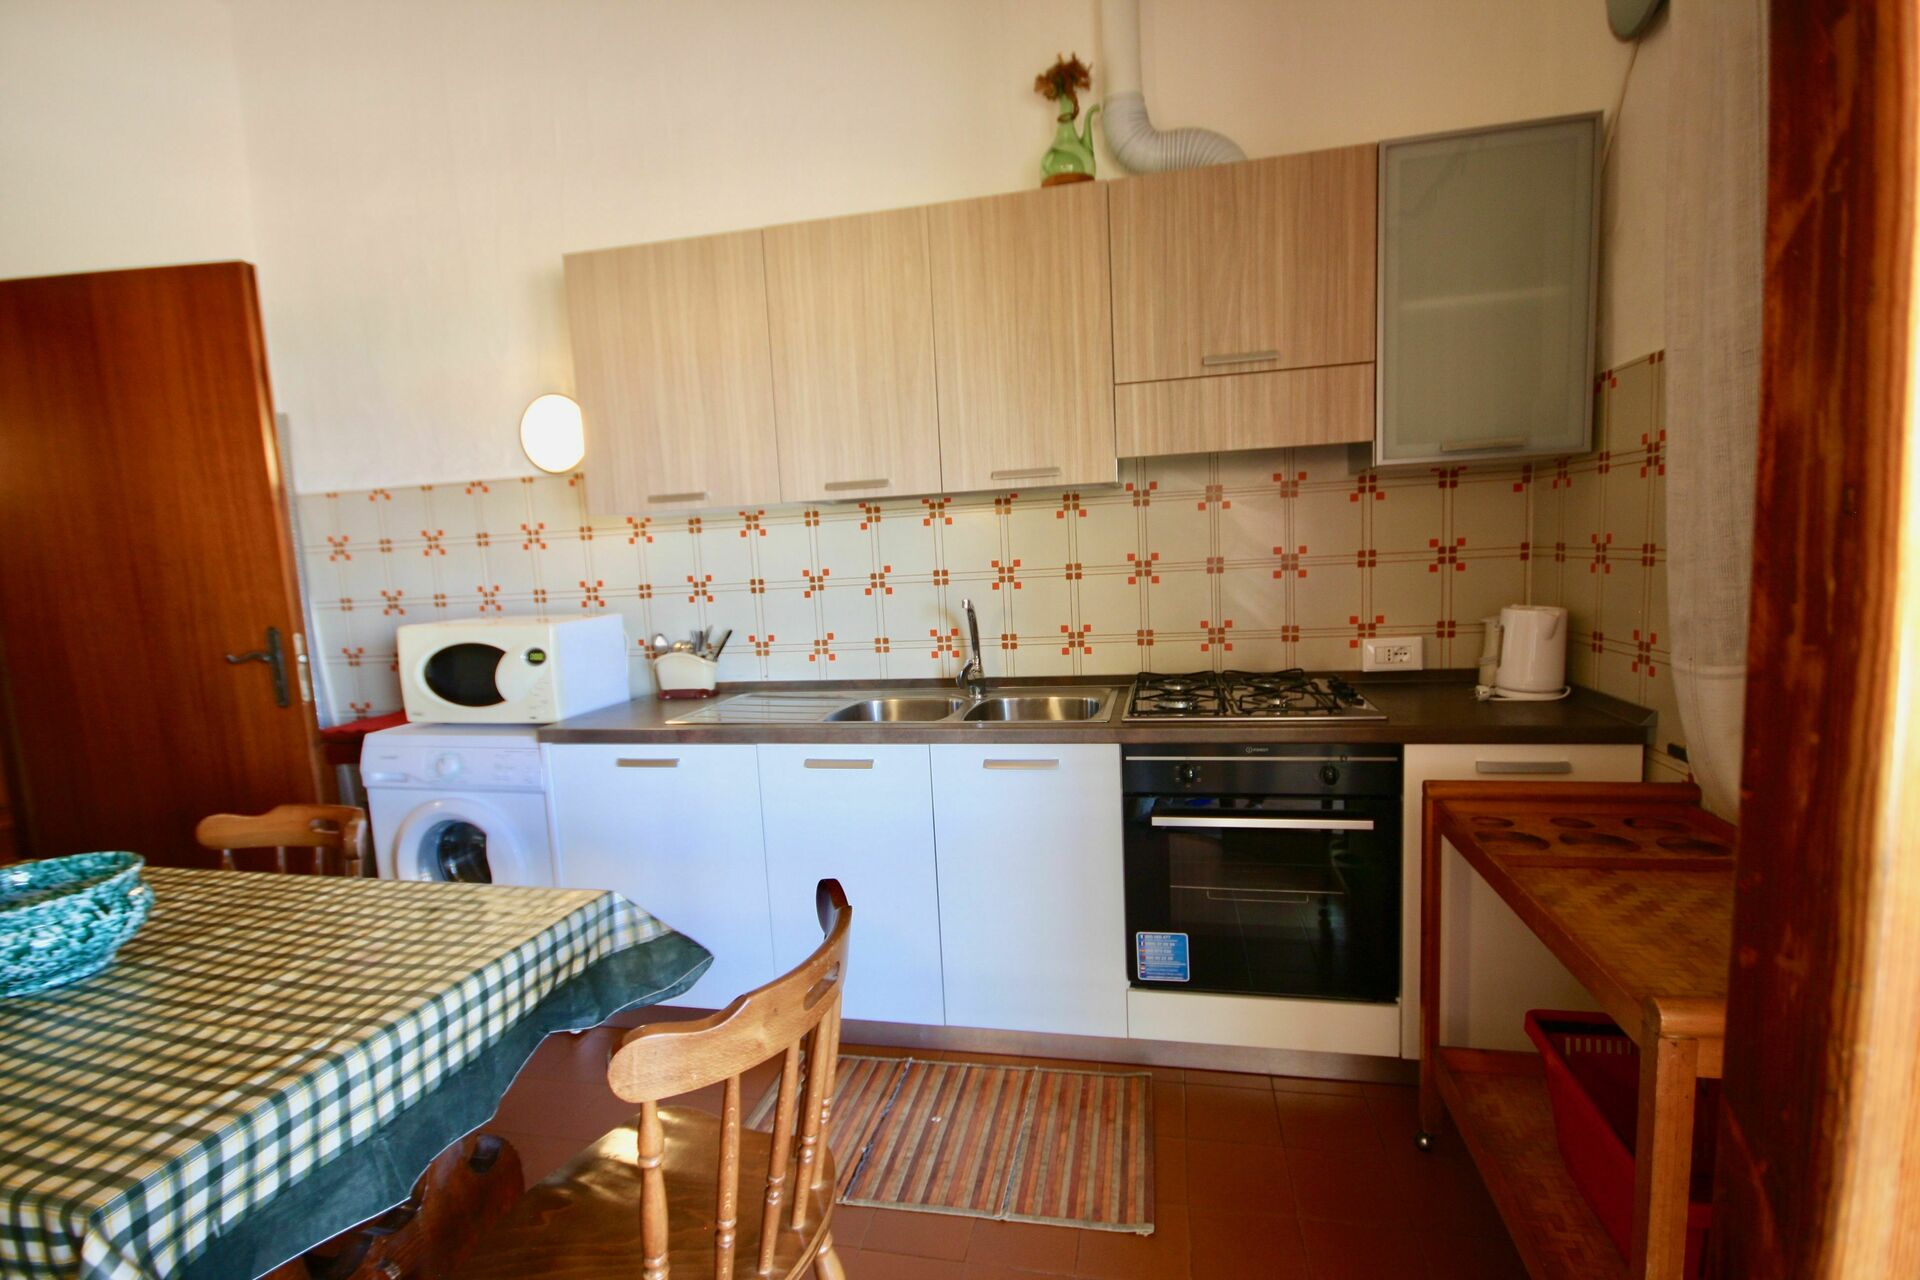 Casa Lilly 8 Posti Letto Bados Olbia, Ferienhaus in Pittulongu ...